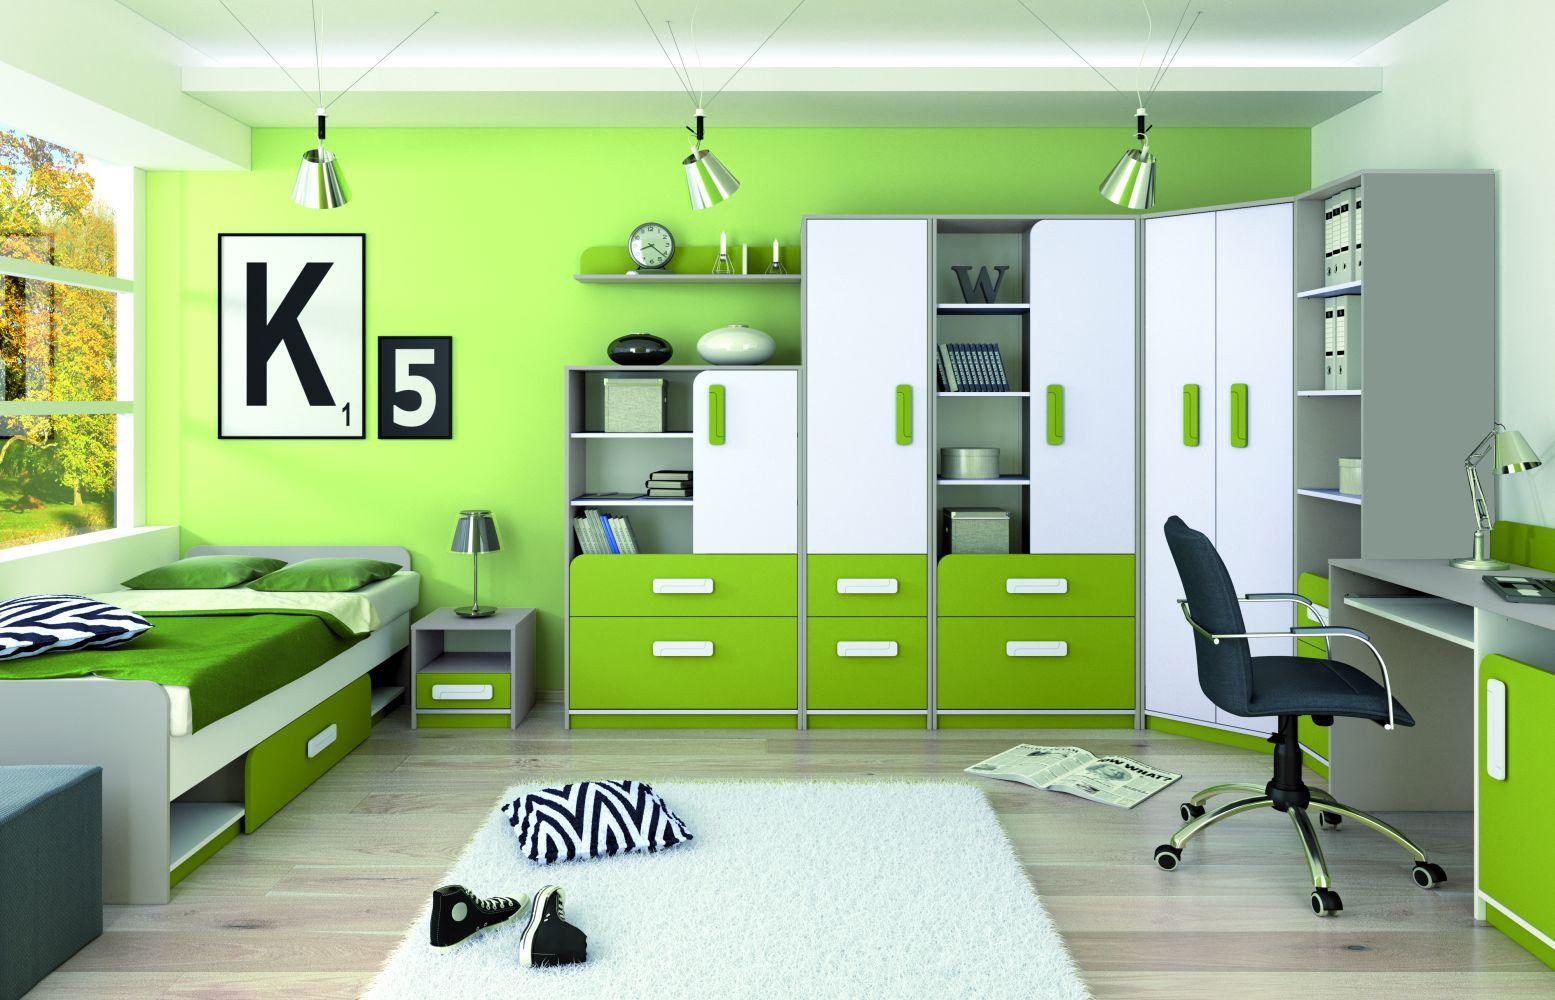 Kinderzimmer Komplett   Set J Renton, 21 teilig, Farbe Platingrau / Weiß /  Grün